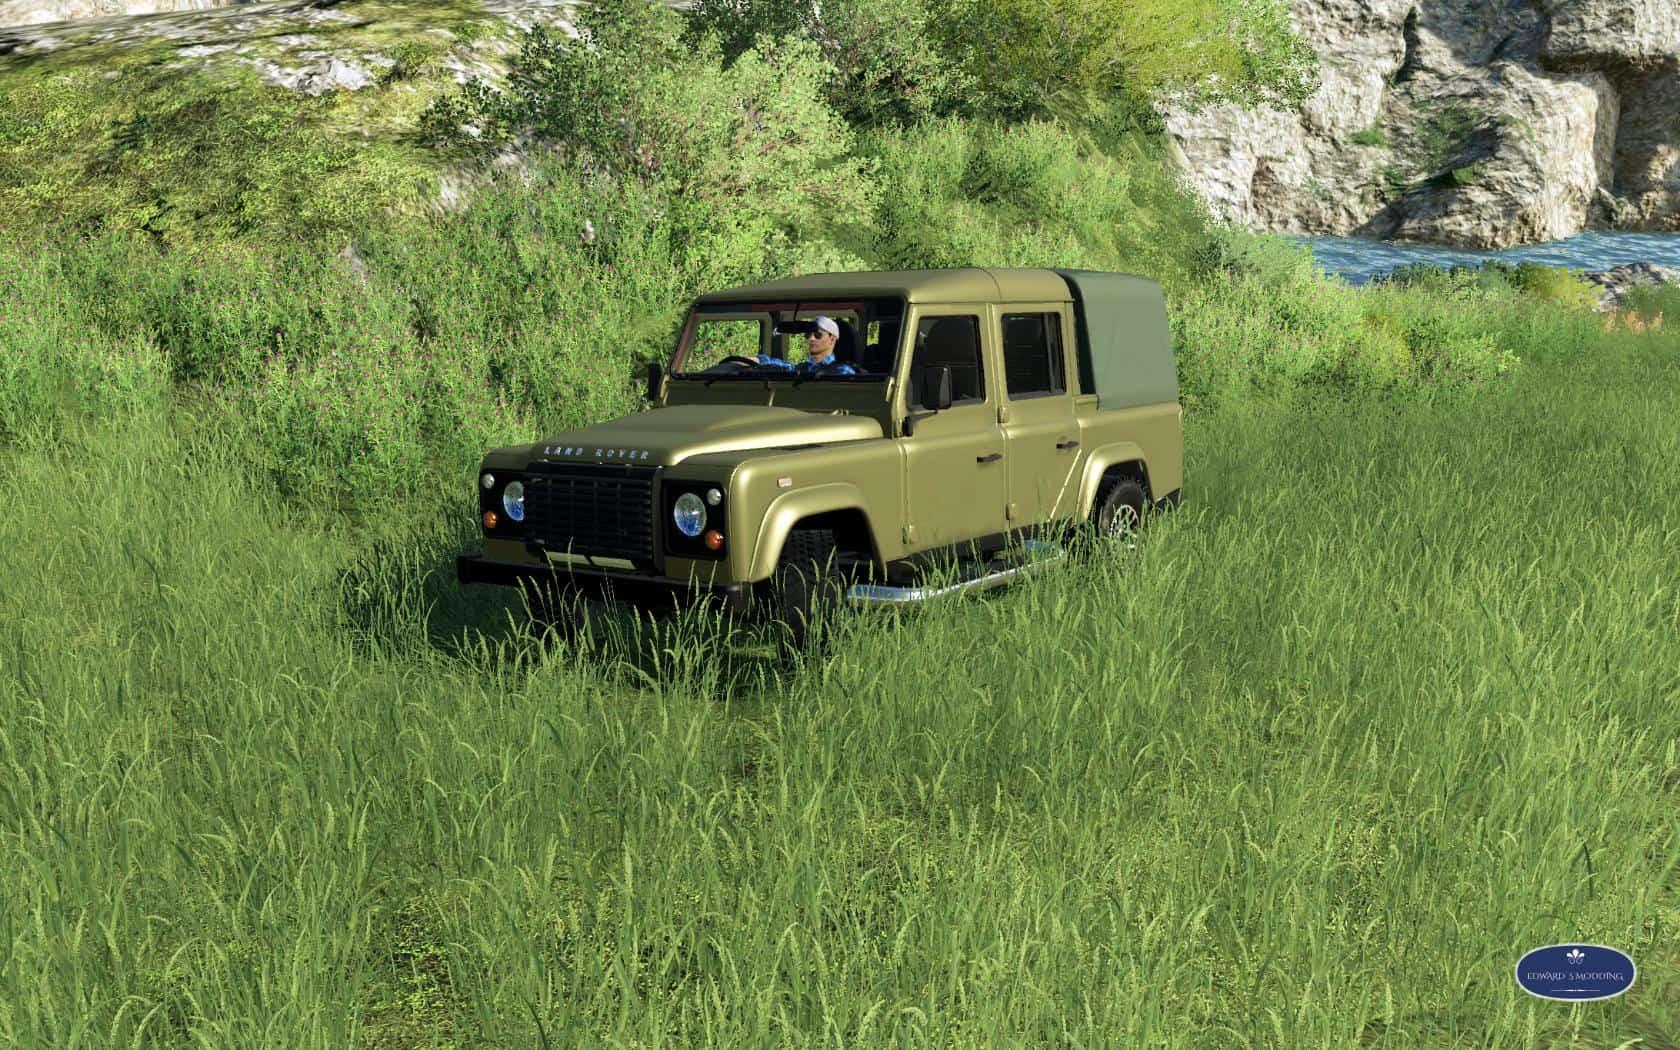 Land Rover Defender 110 v1 0 FS19 - Farming Simulator 19 Mod